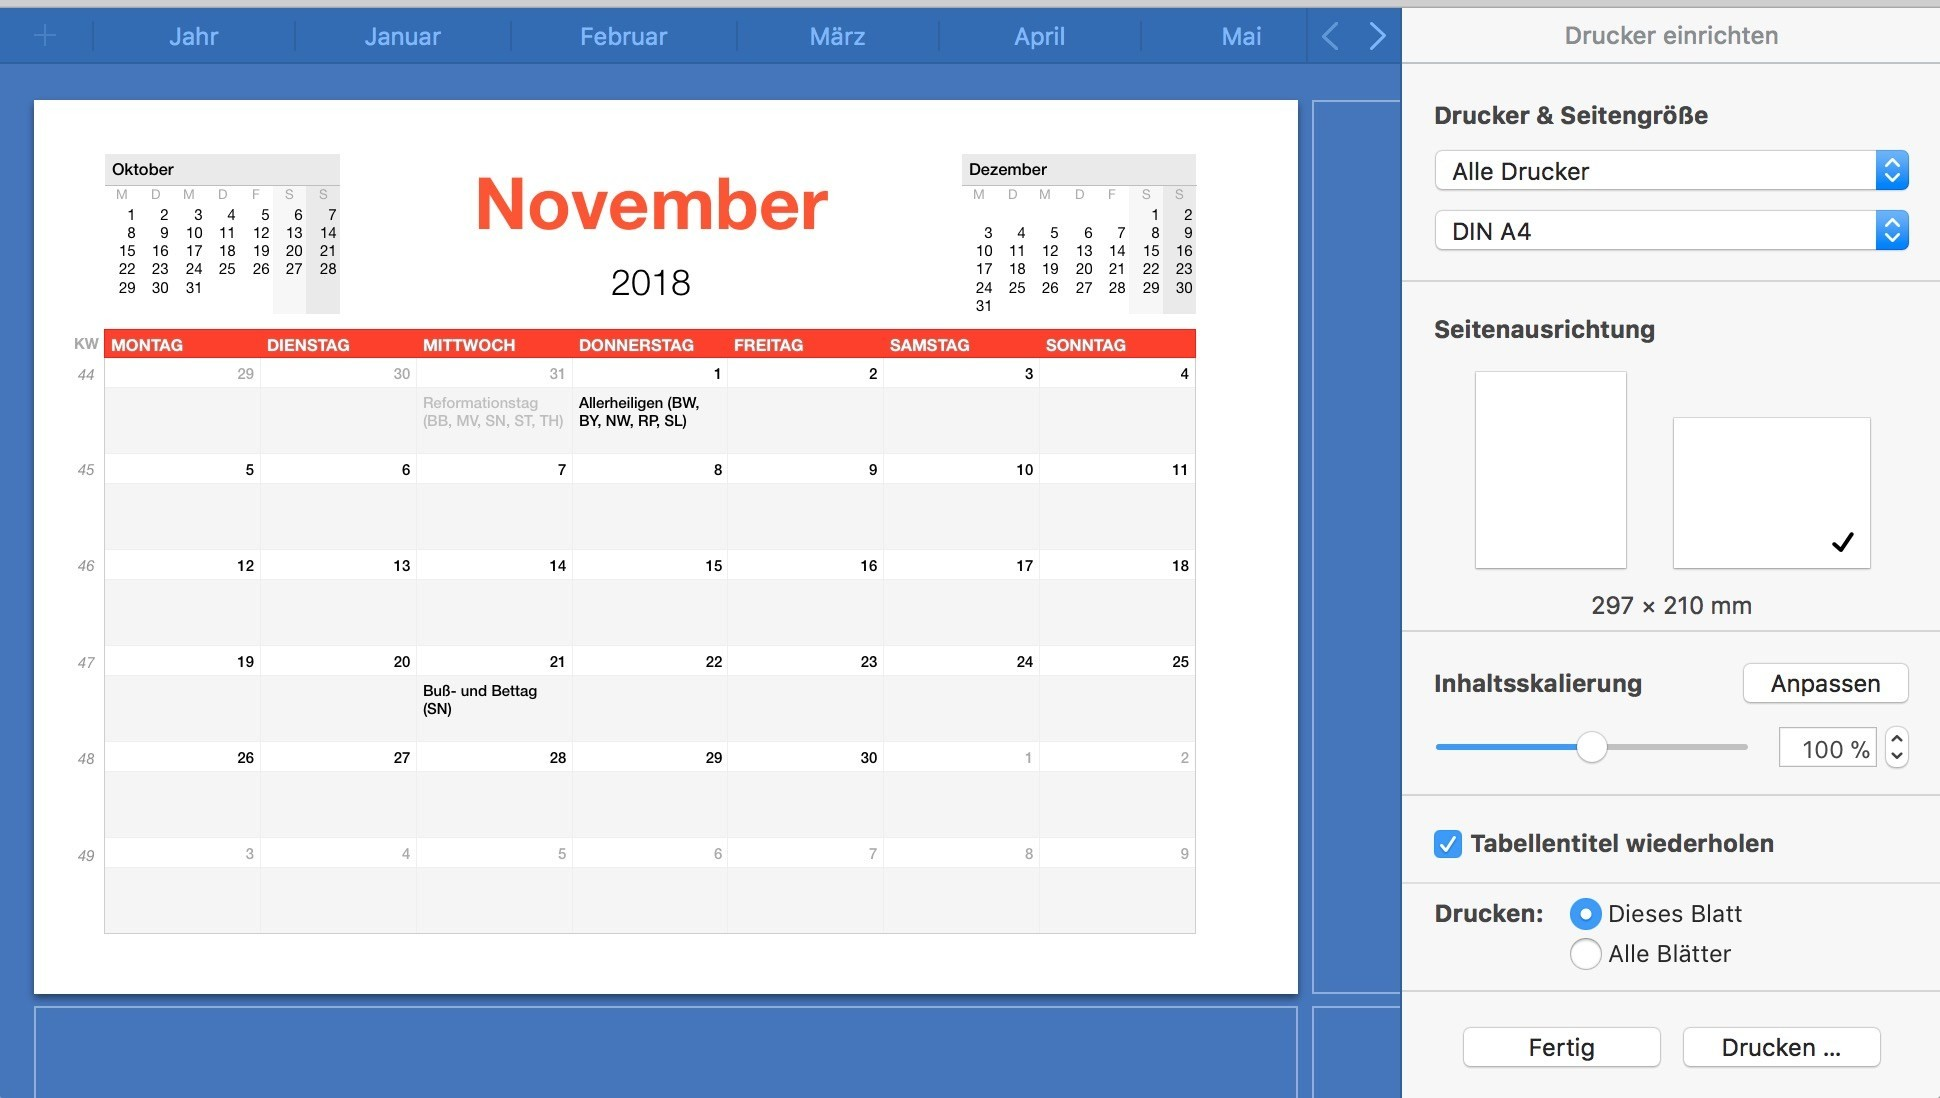 Kalender 2019 Pdf Más Recientemente Liberado Kalender Drucken Bilder